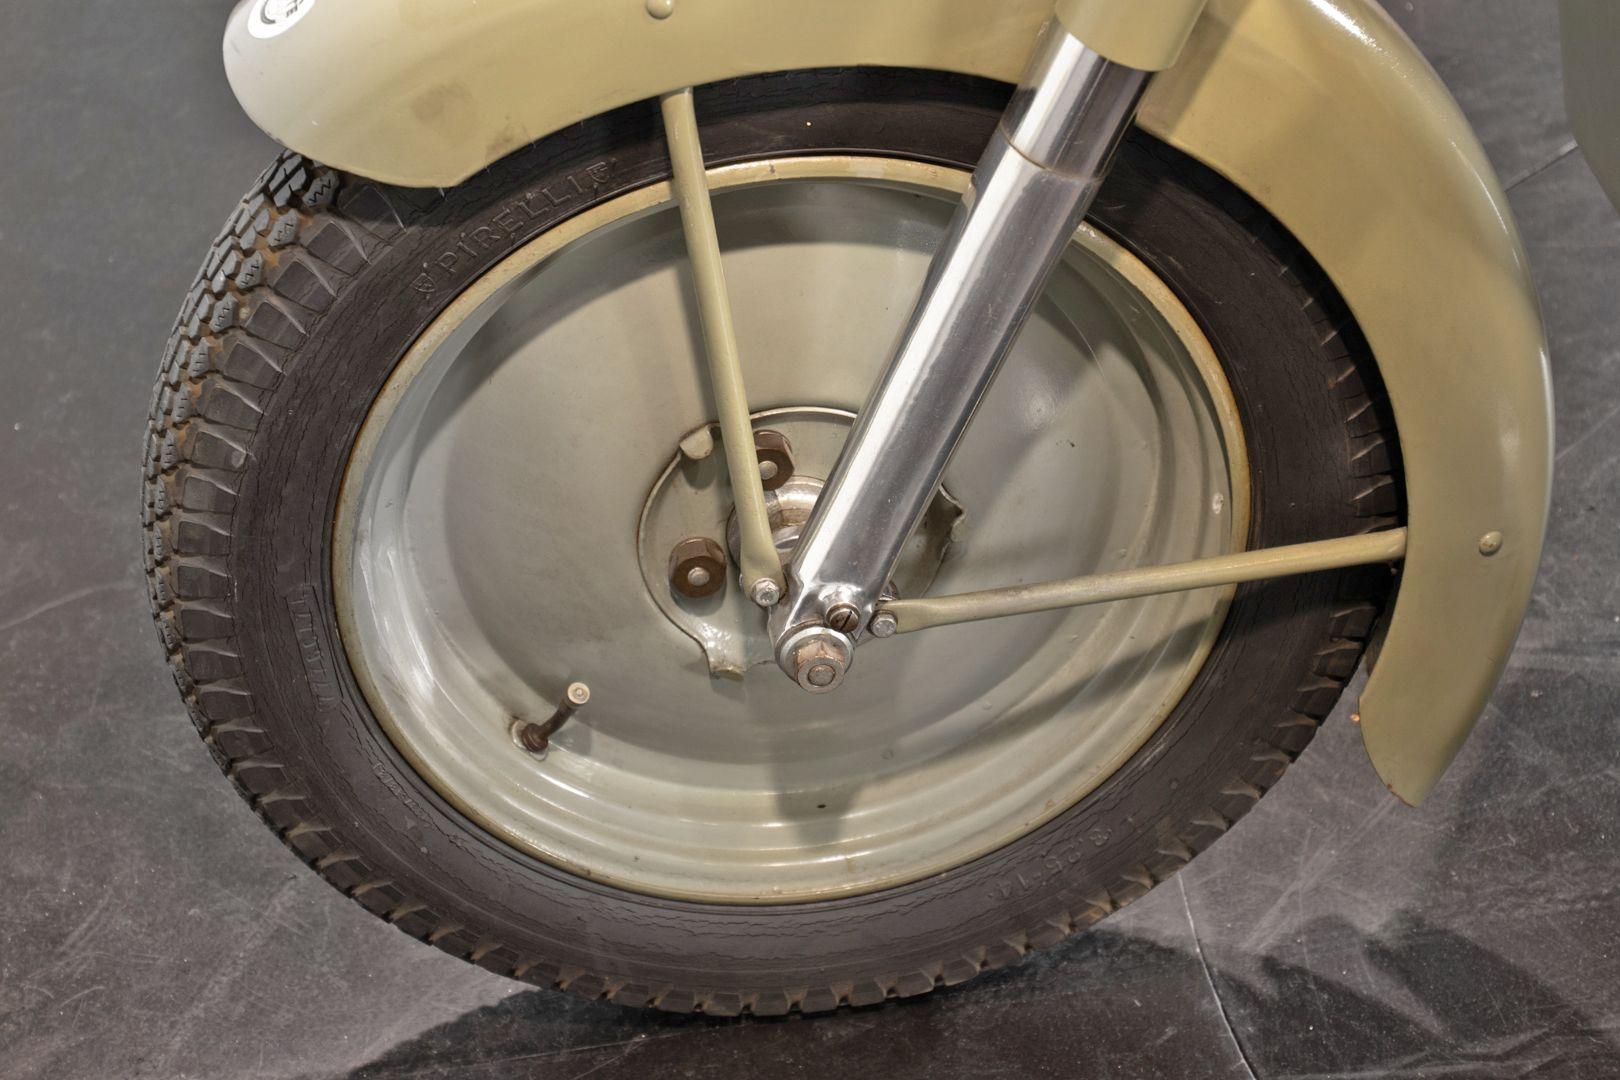 1956 Benelli 125 Leoncino Rikshaws 74337